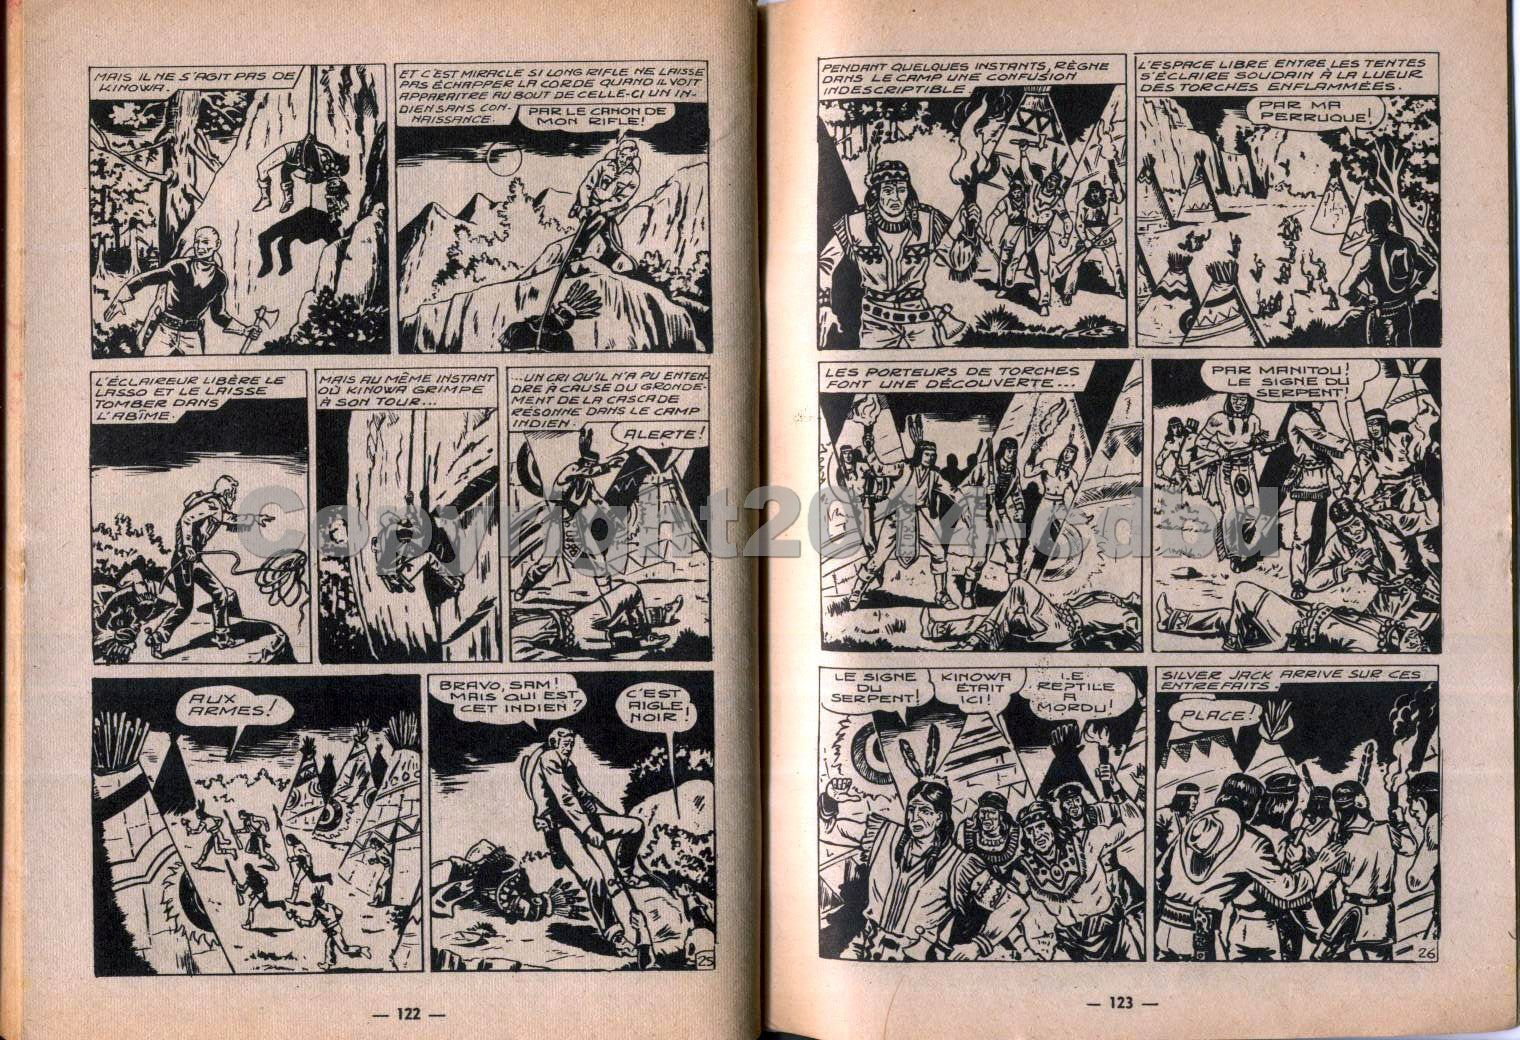 Yuma mensuel n°9 - Juillet 1963- pages 58 à fin